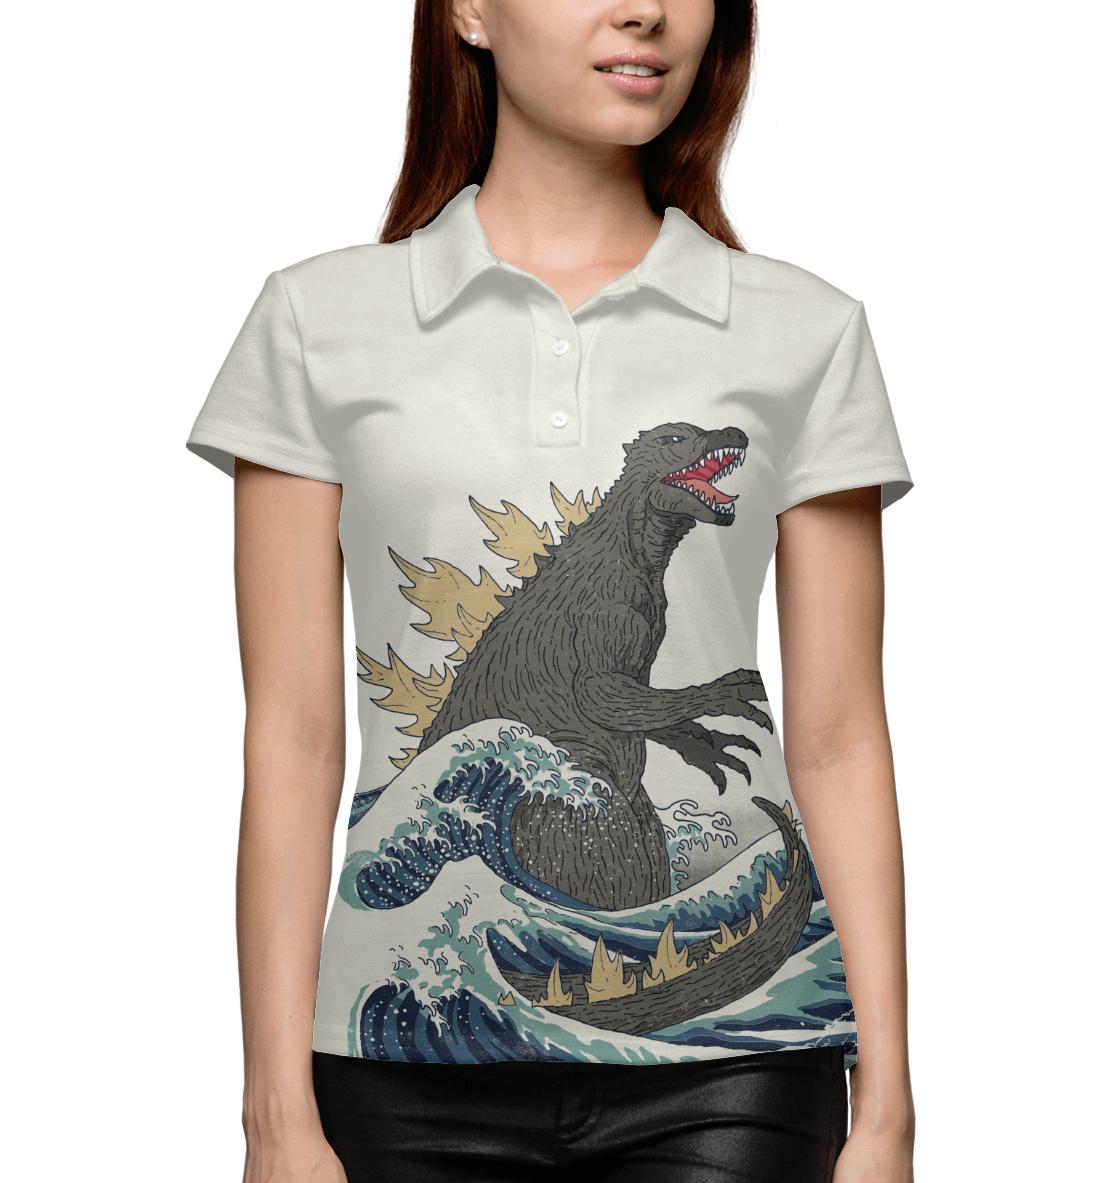 Купить Godzilla, Printbar, Поло, KNO-948120-pol-1